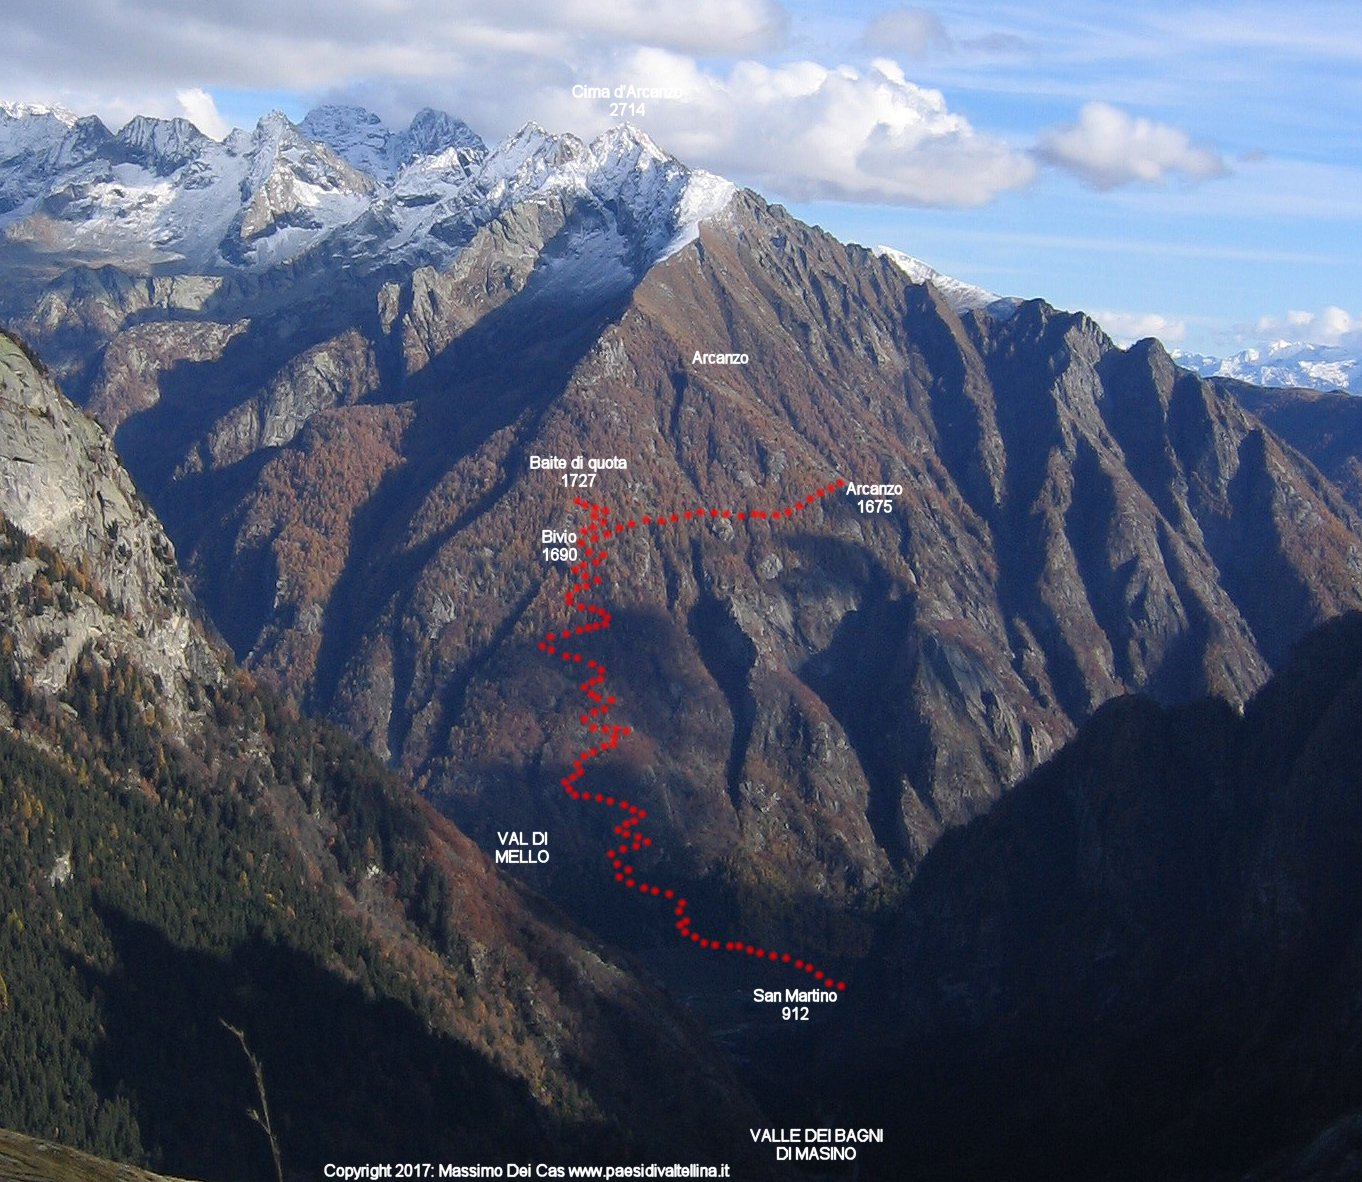 Verso Arcanzo, in Val Masino